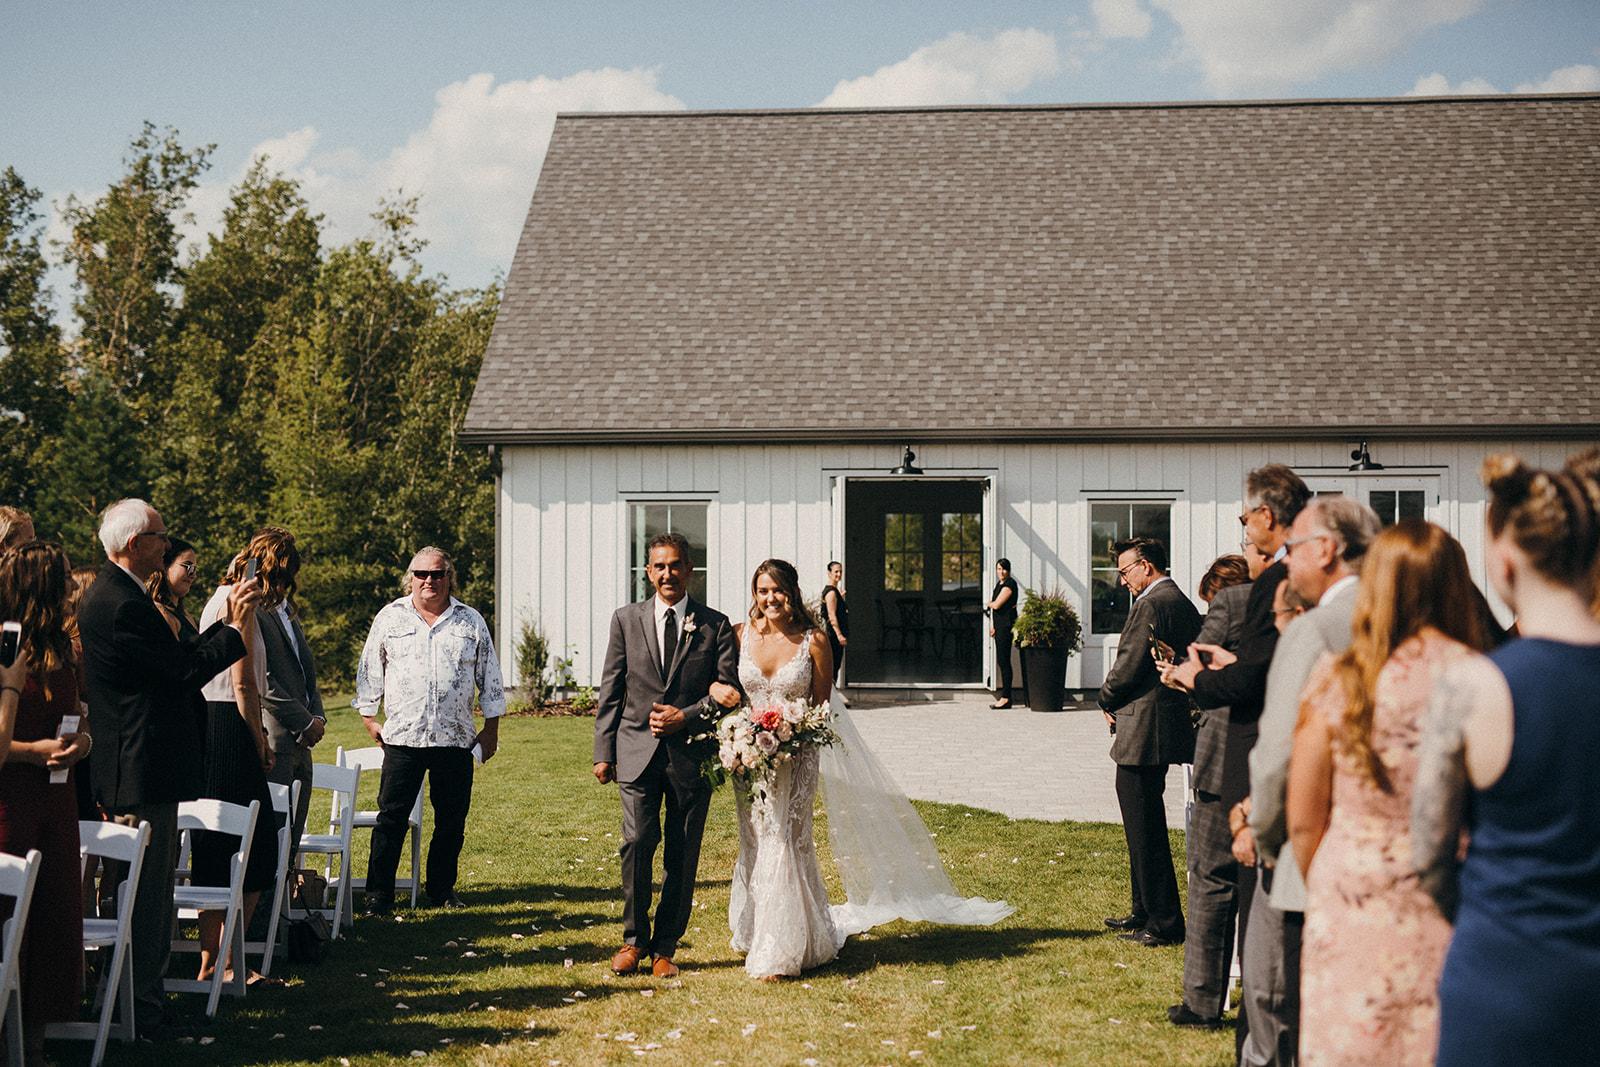 kaden_justine_wedding_1173.jpg